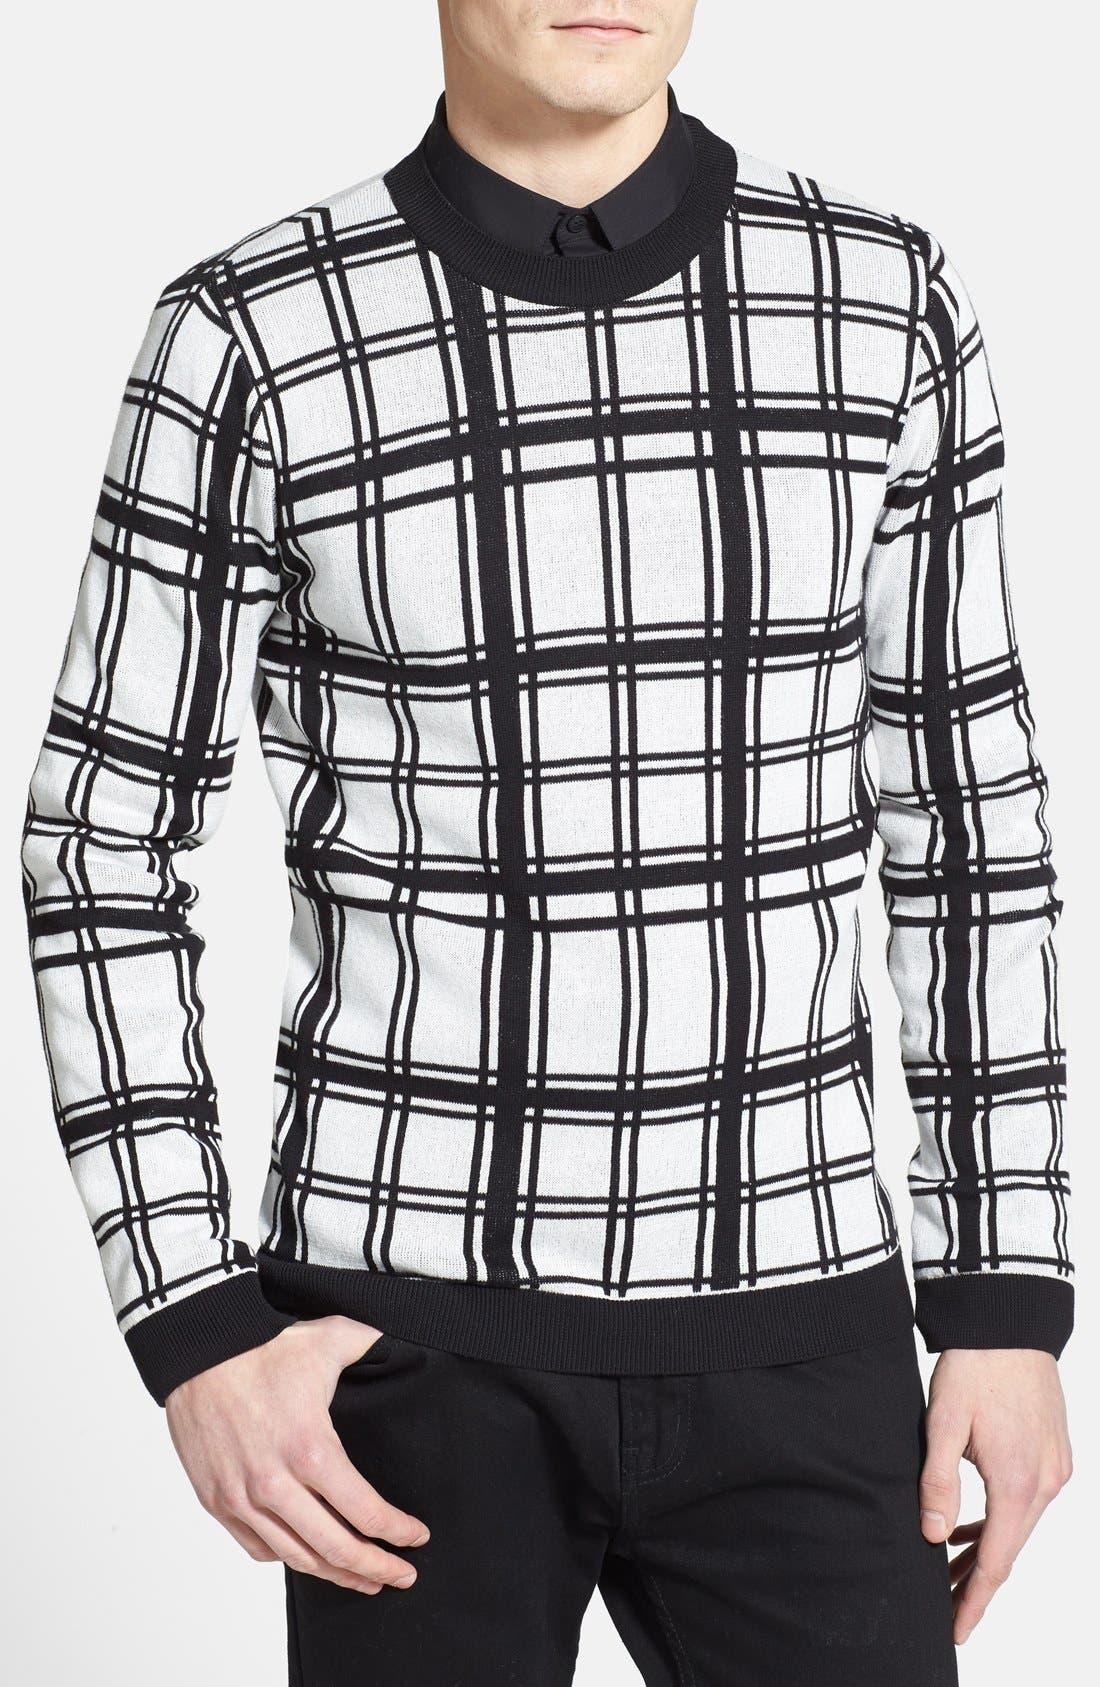 Main Image - Topman Check Crewneck Sweater